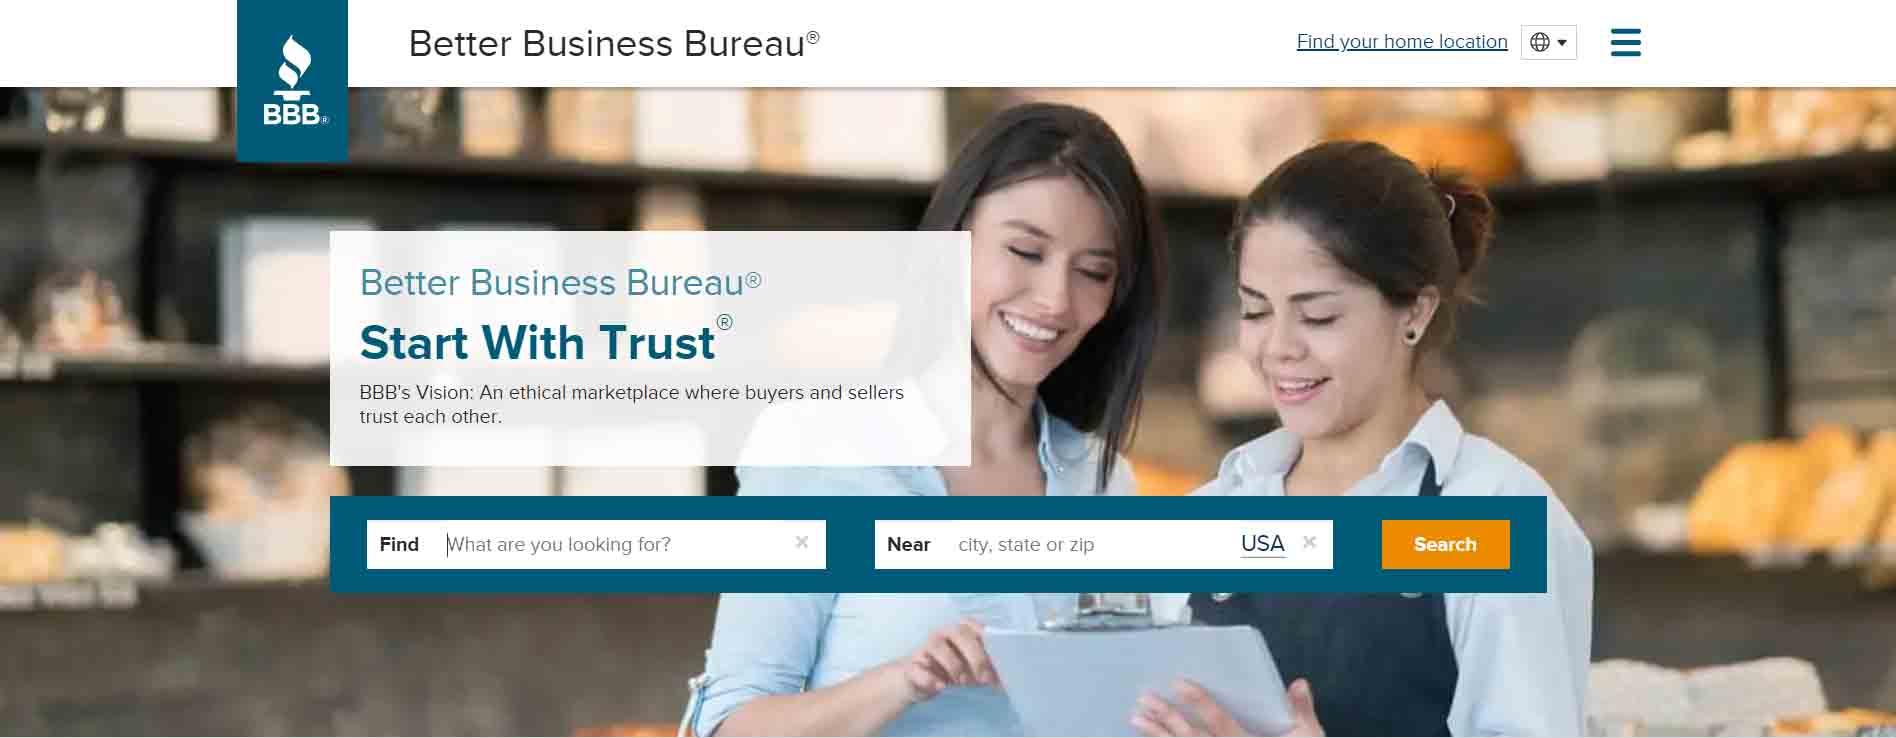 better business bureau main page